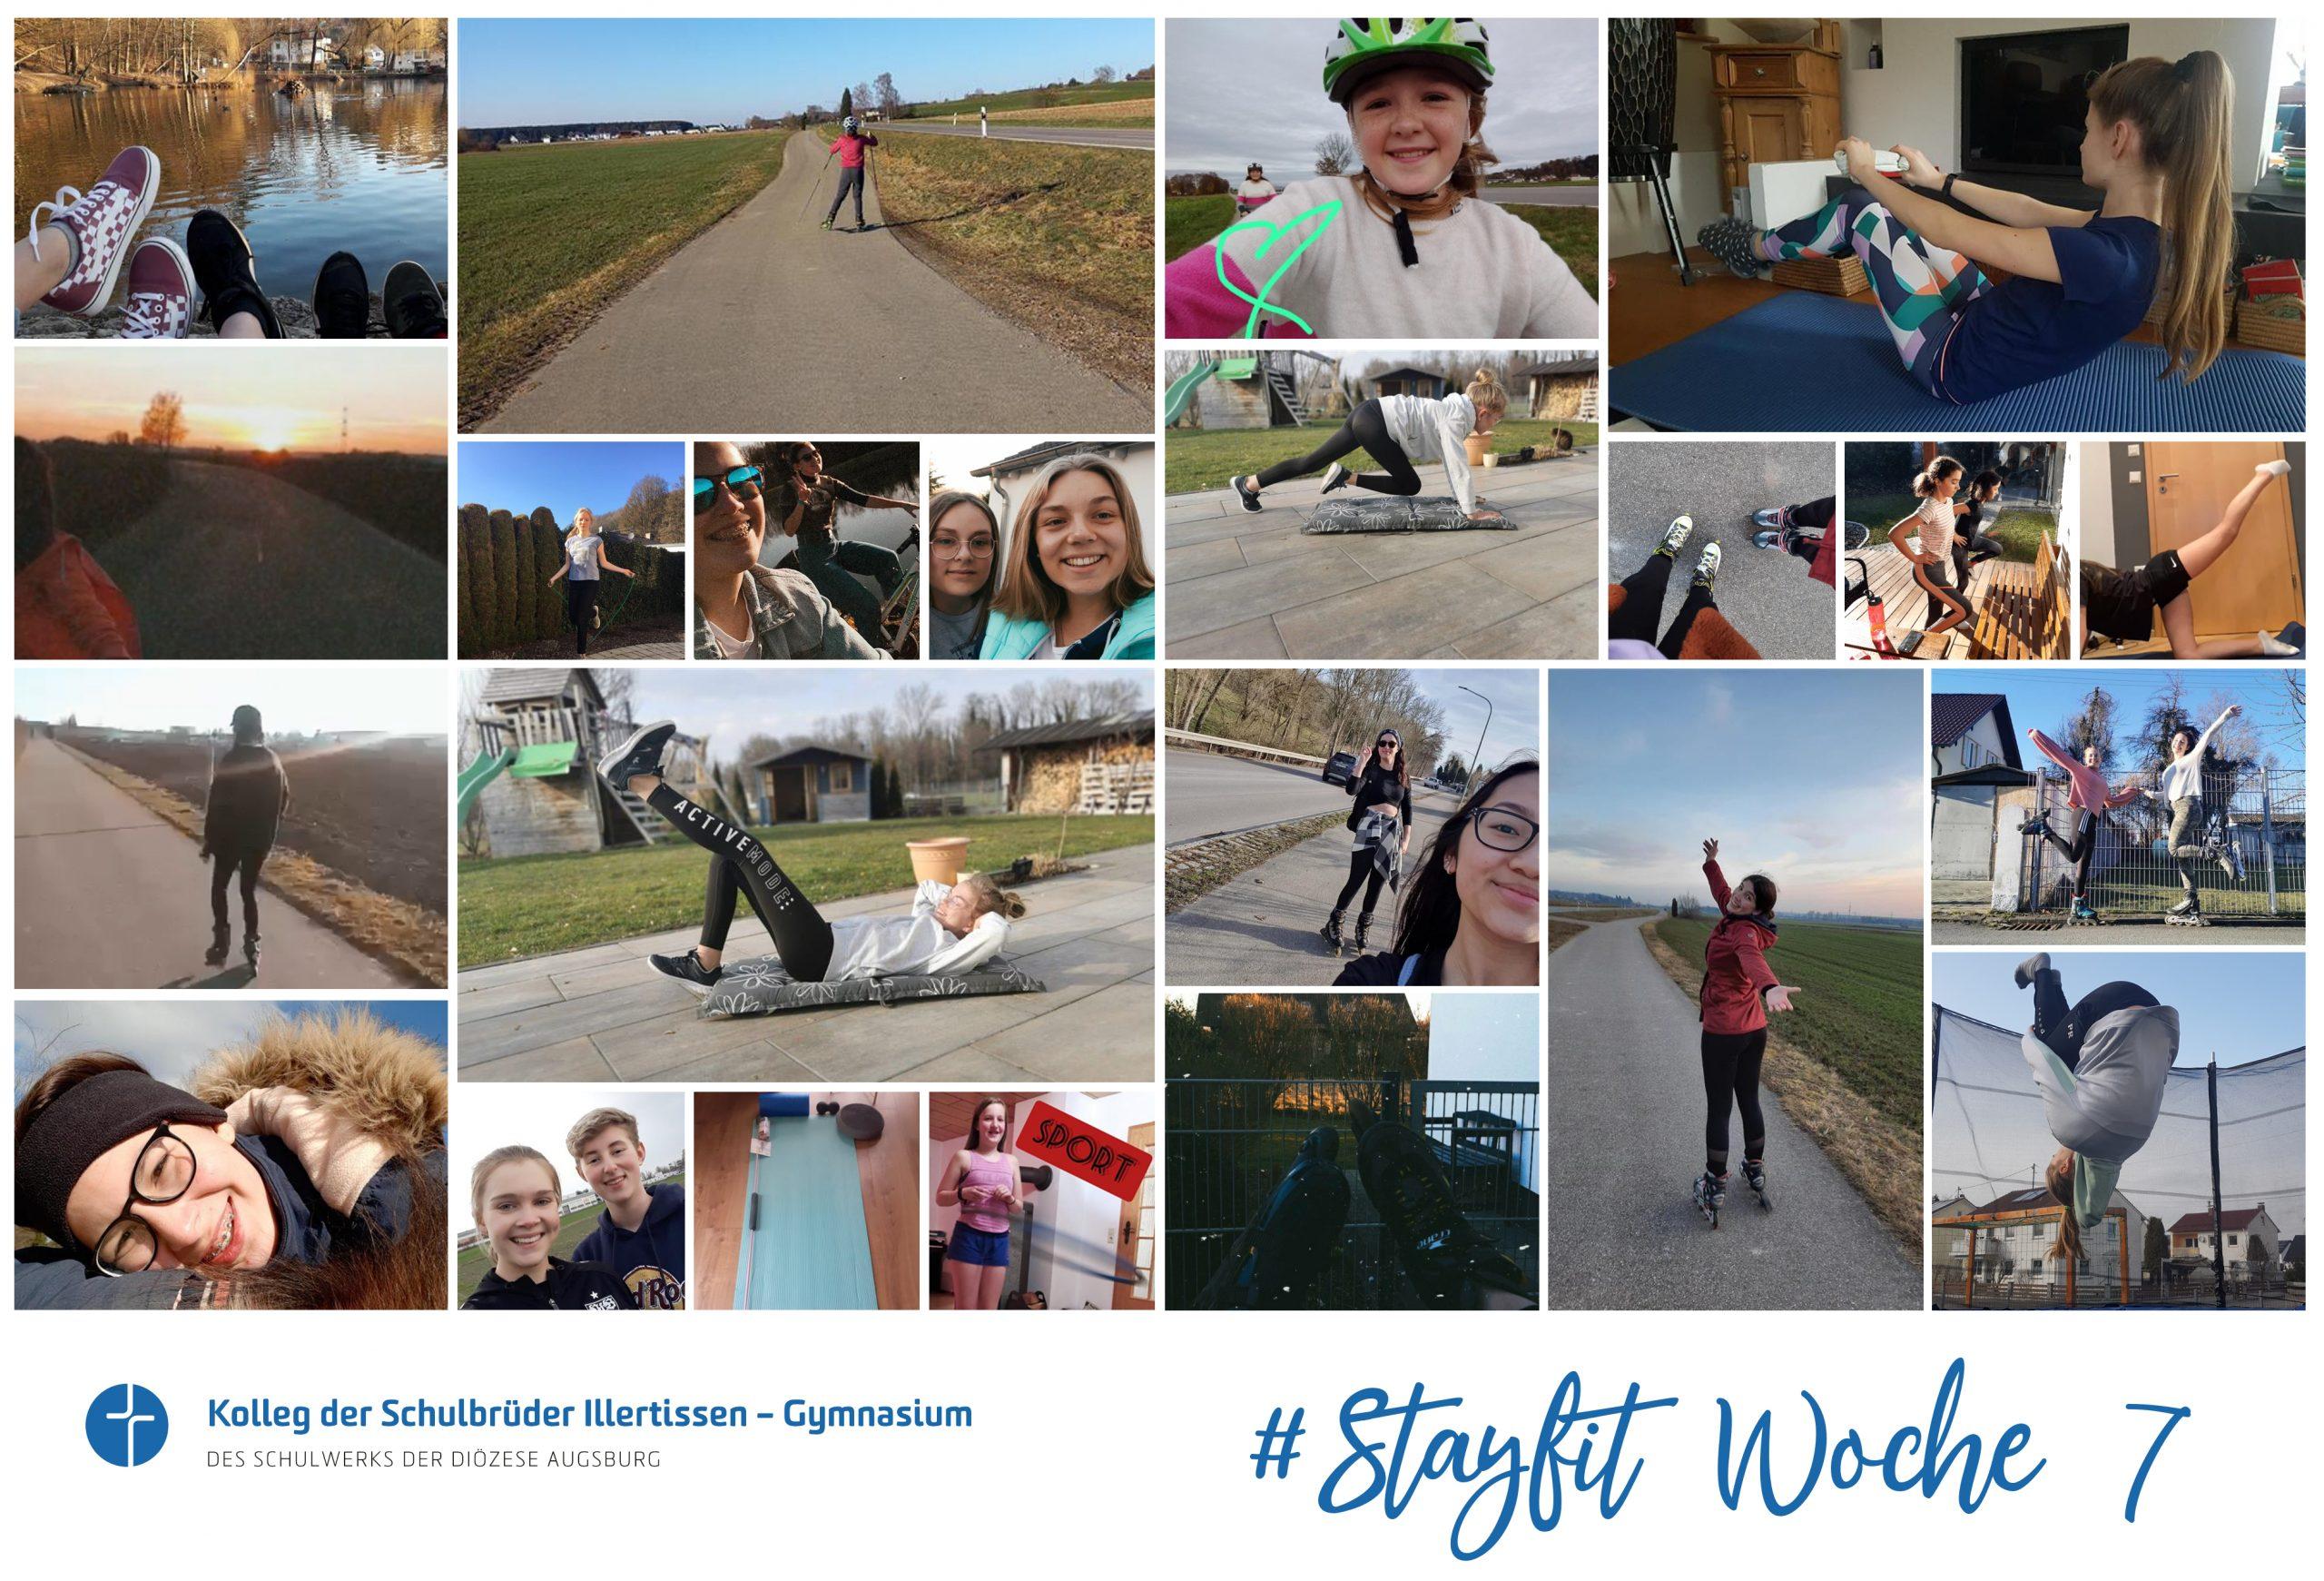 #stayfit Woche 7